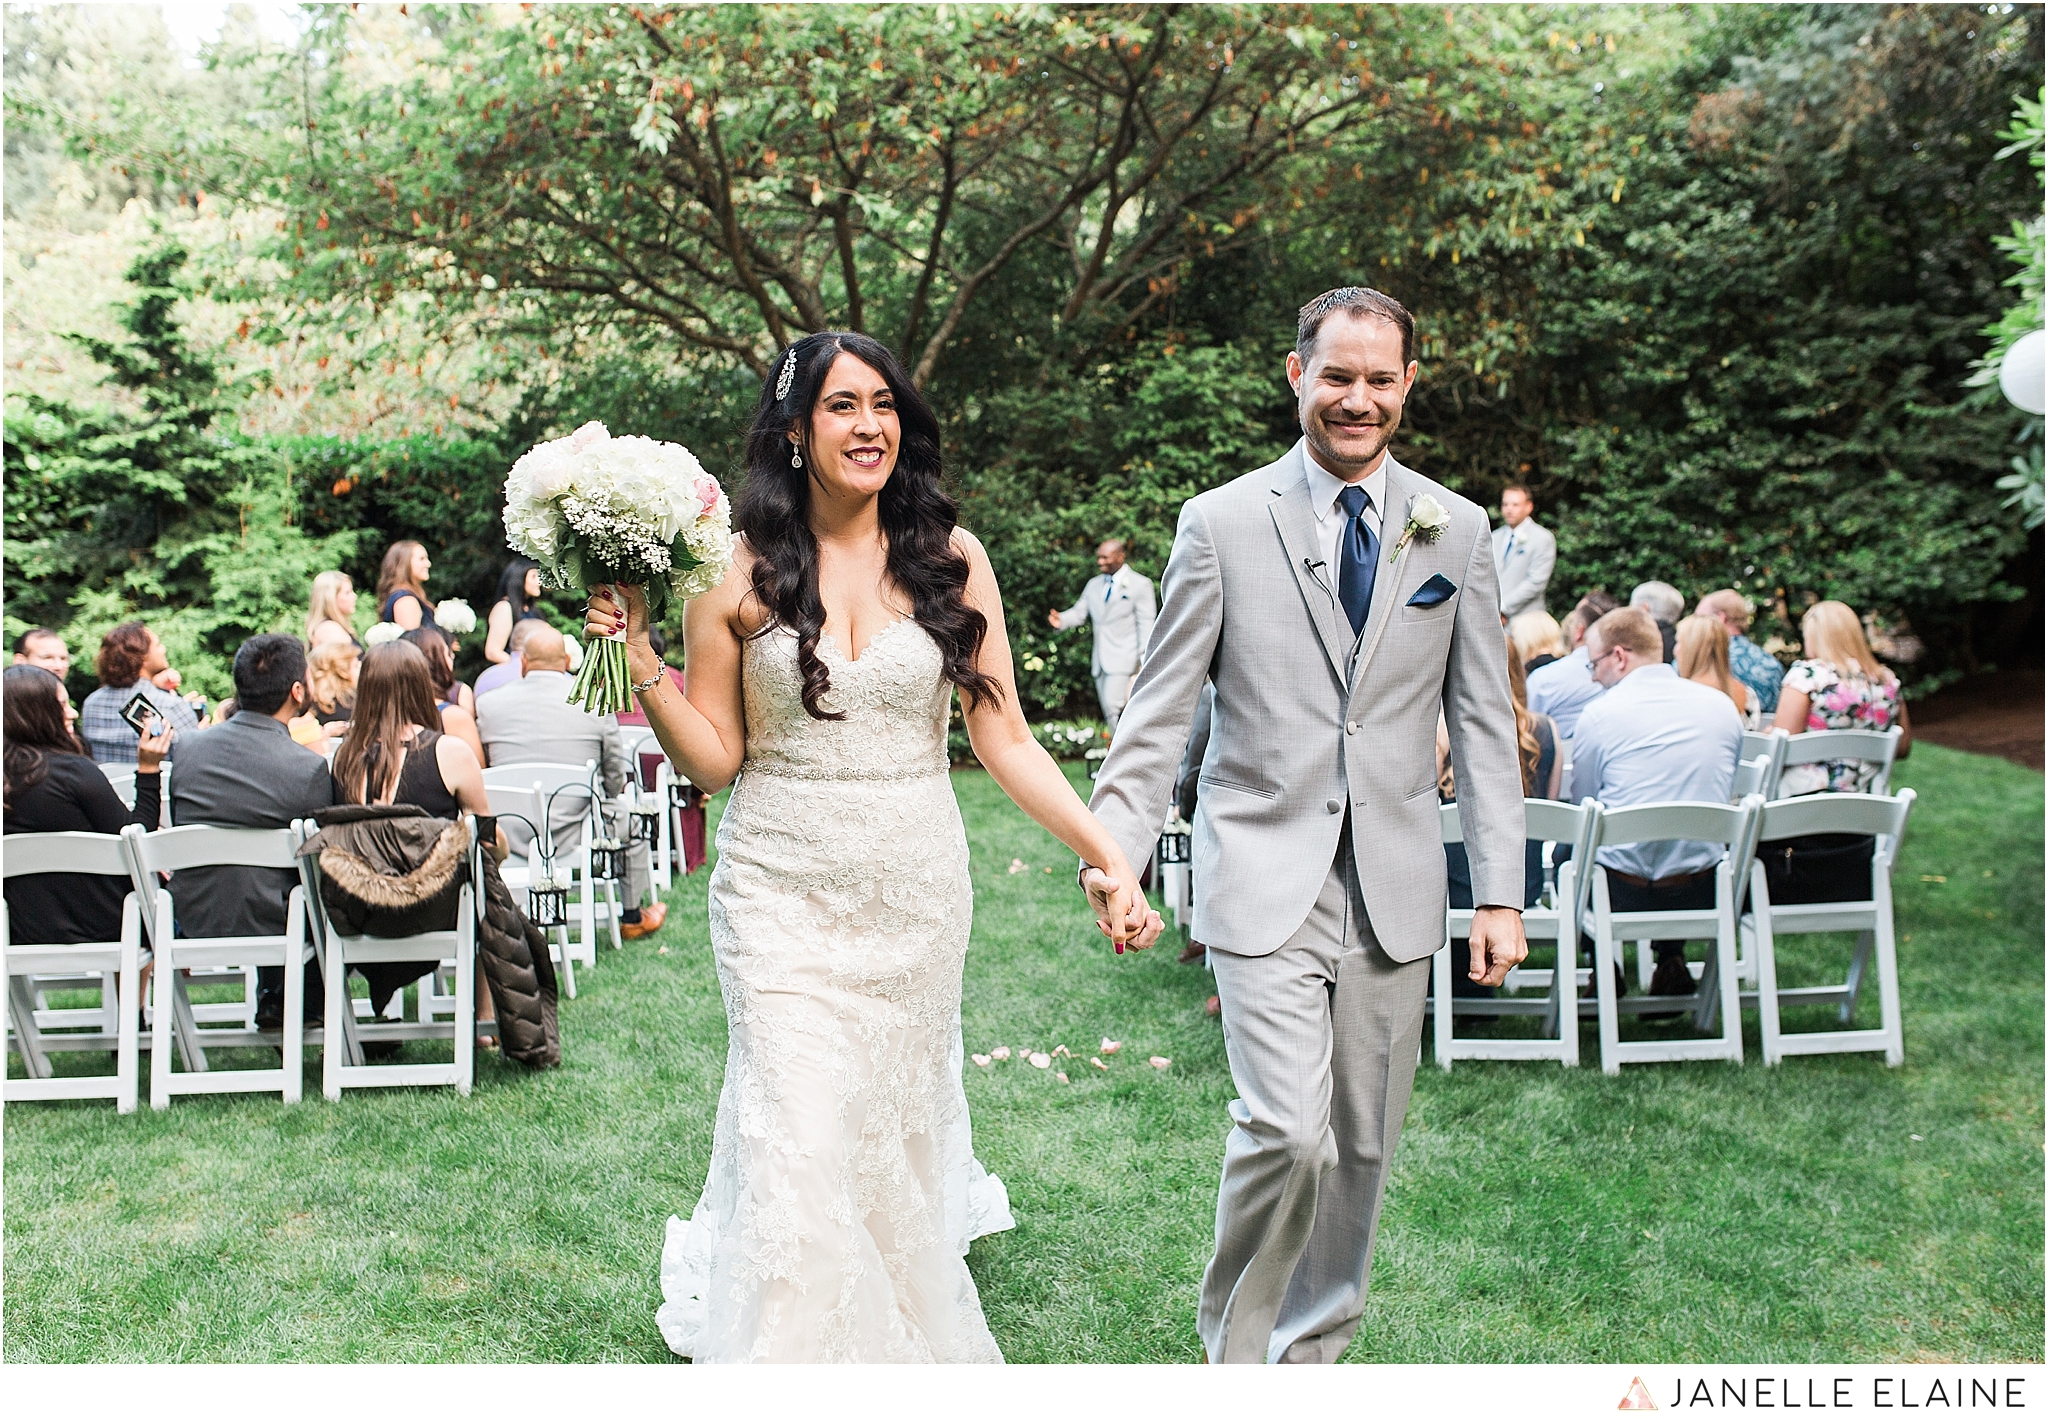 janelle elaine photography-professional wedding photographer-seattle-bellevue-robinswood house-178.jpg